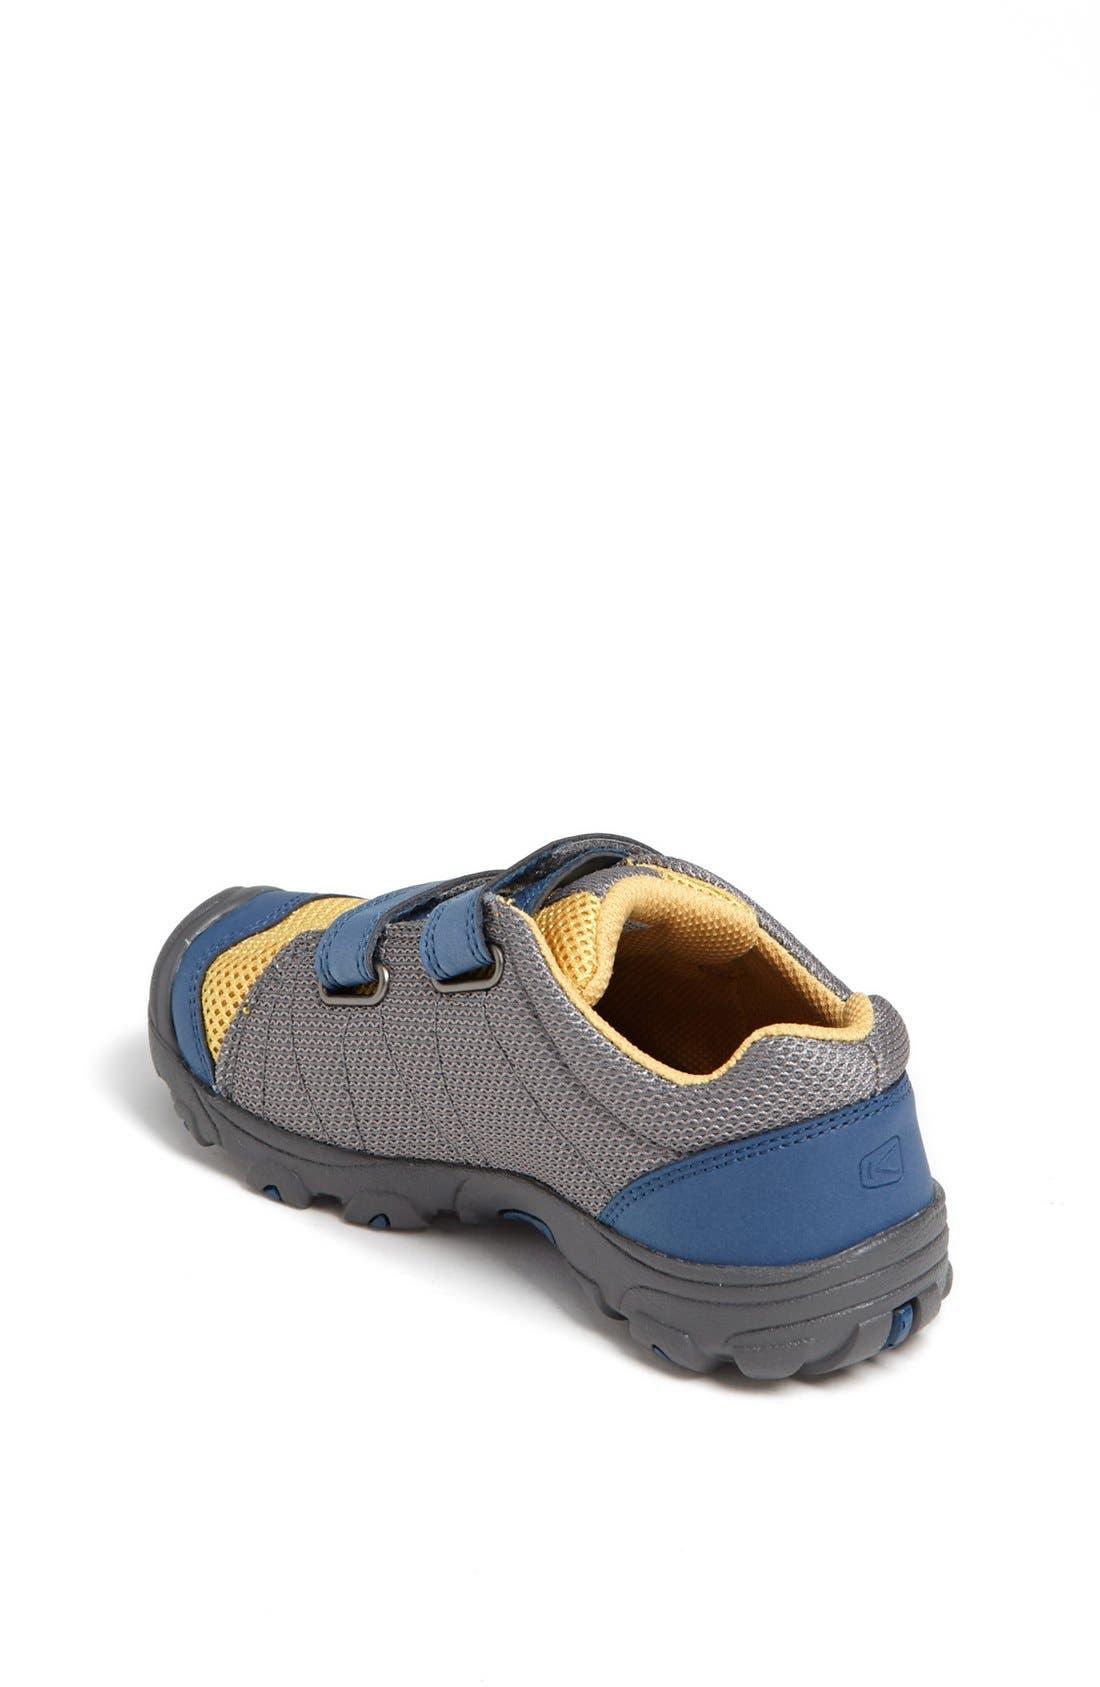 Alternate Image 2  - Keen 'Riggins' Sneaker (Baby, Walker, Toddler & Little Kid)